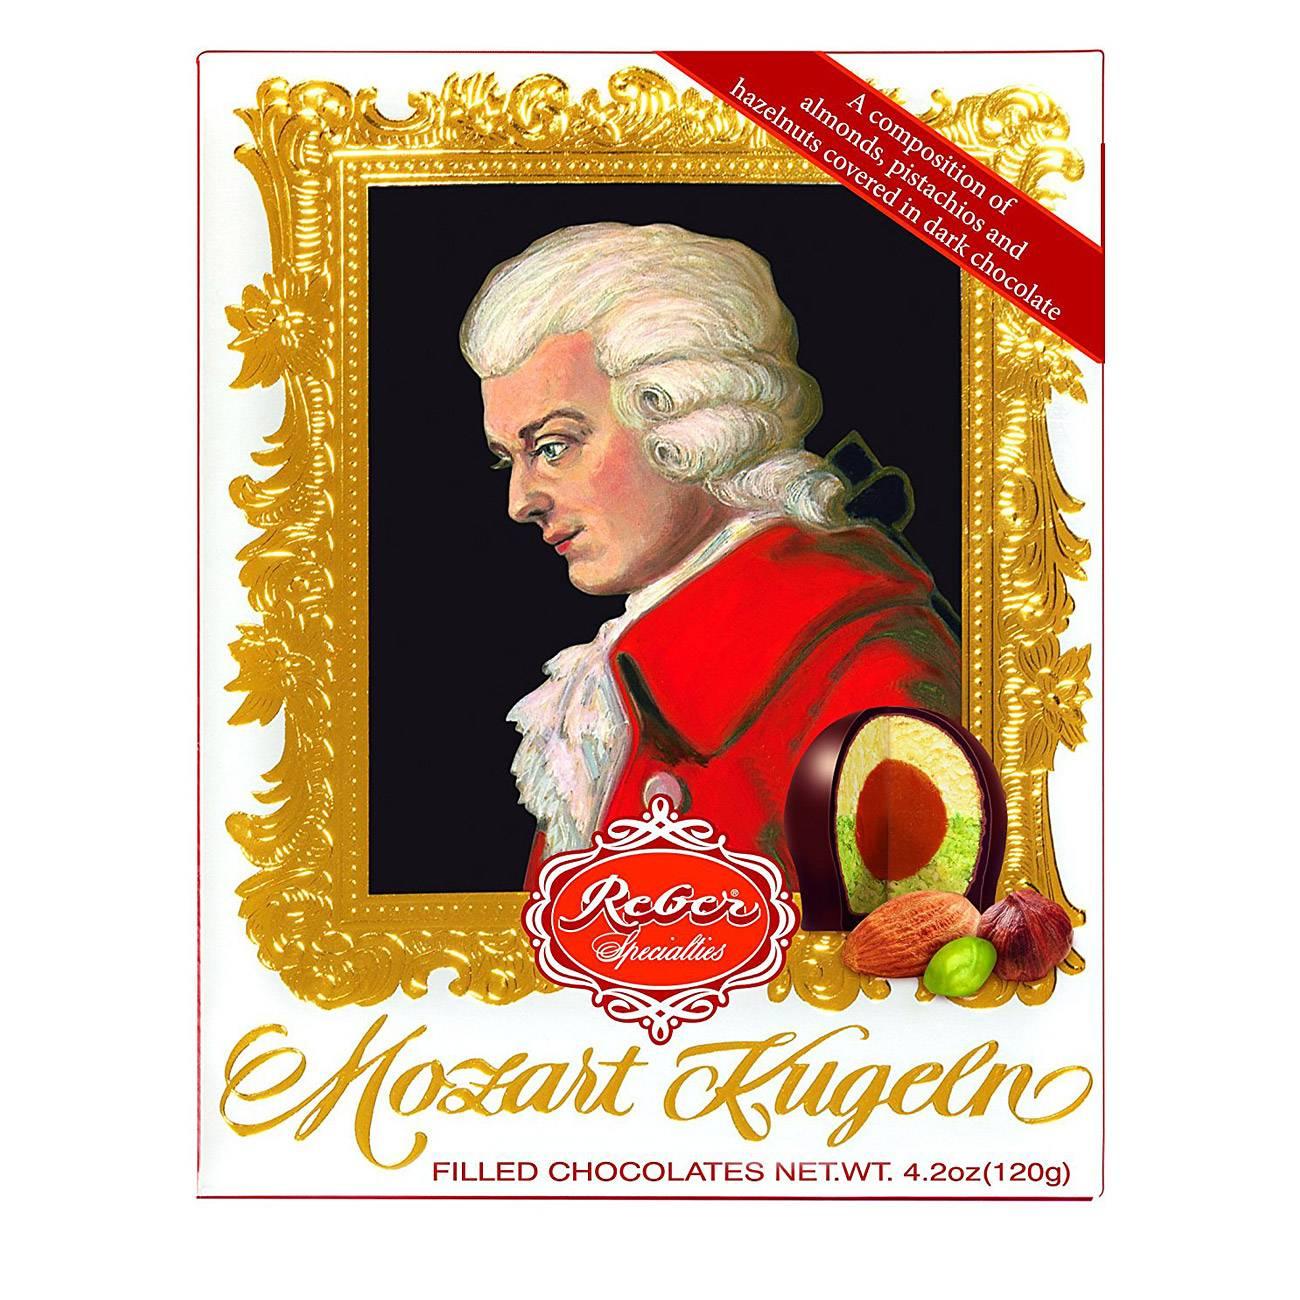 355 MOZART-KUGELN CHOCOLATES 120 Grame